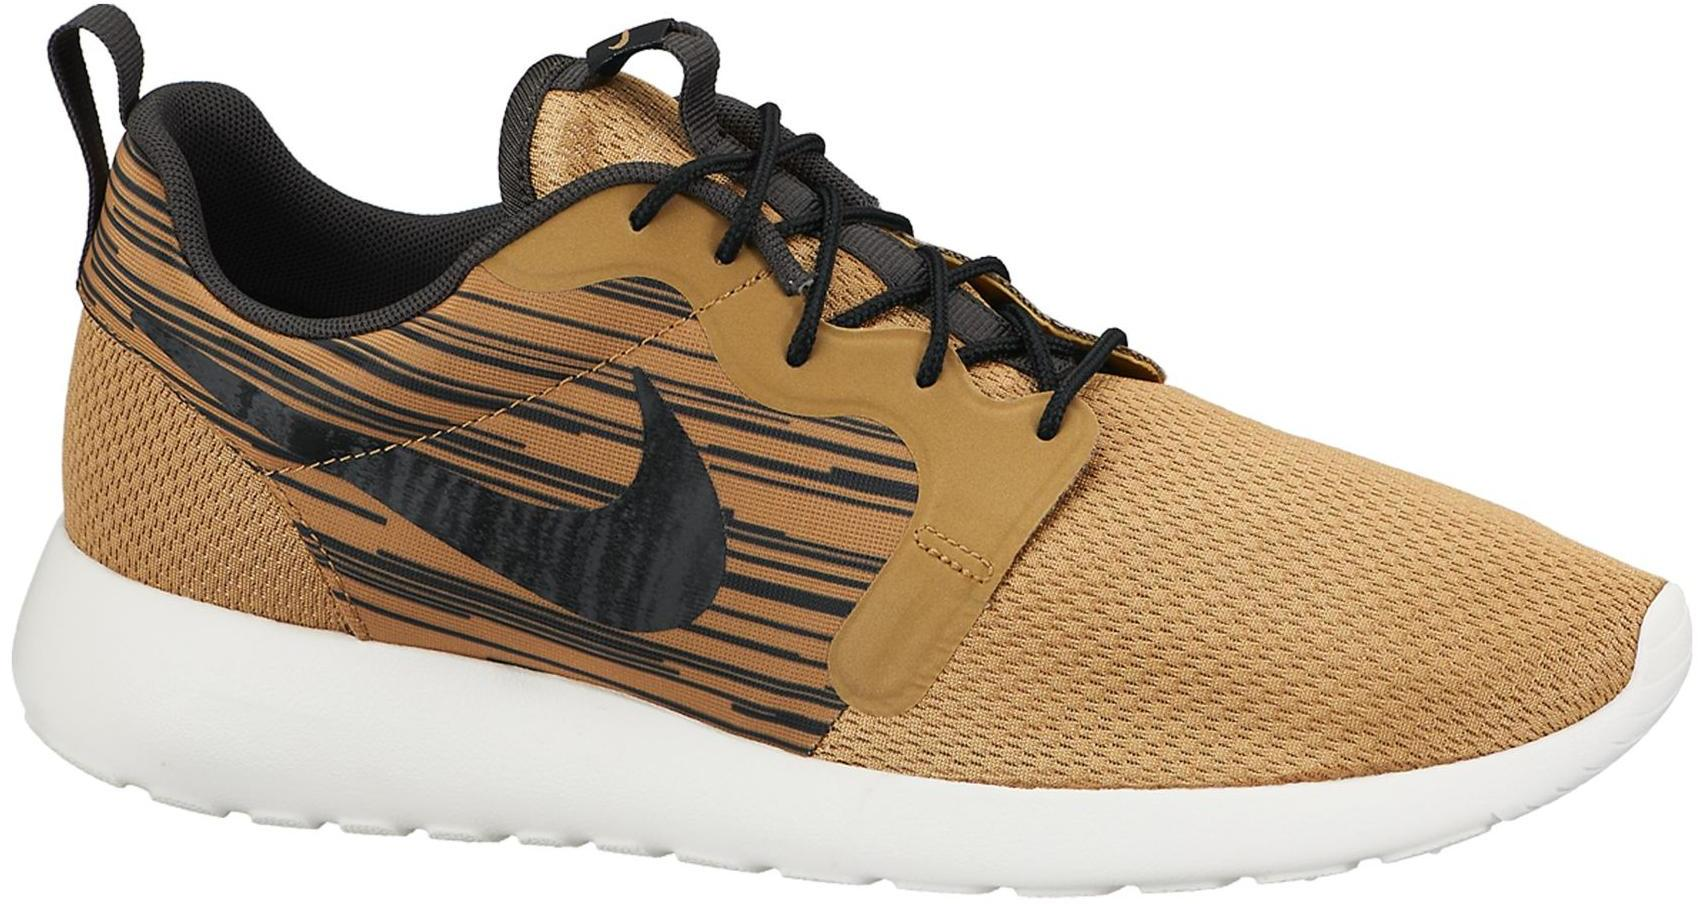 Nike Roshe Run Hyperfuse Metallic Gold